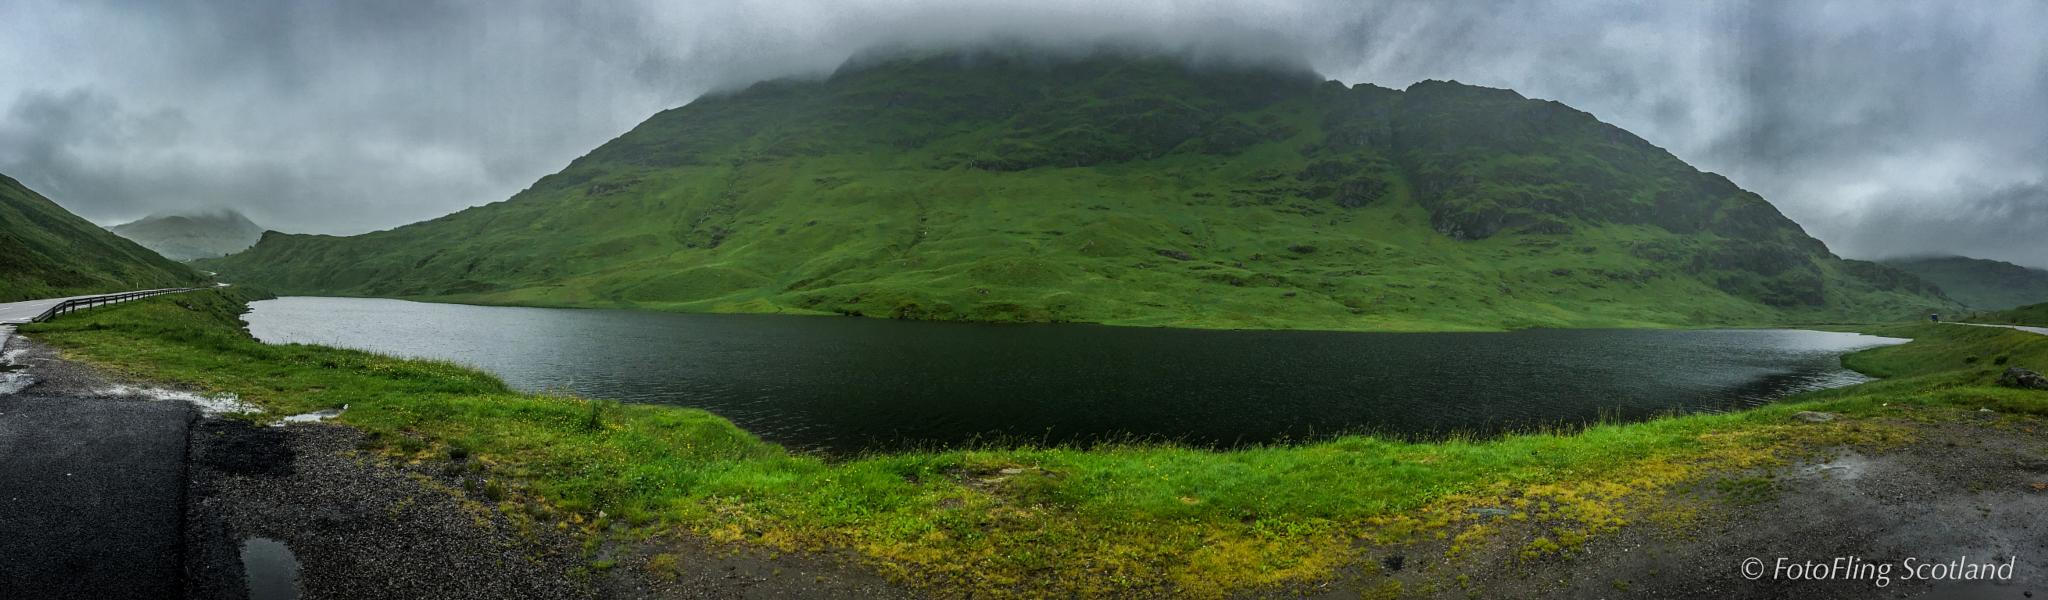 Loch Restil, Cairndow  by FotoFlingScotland